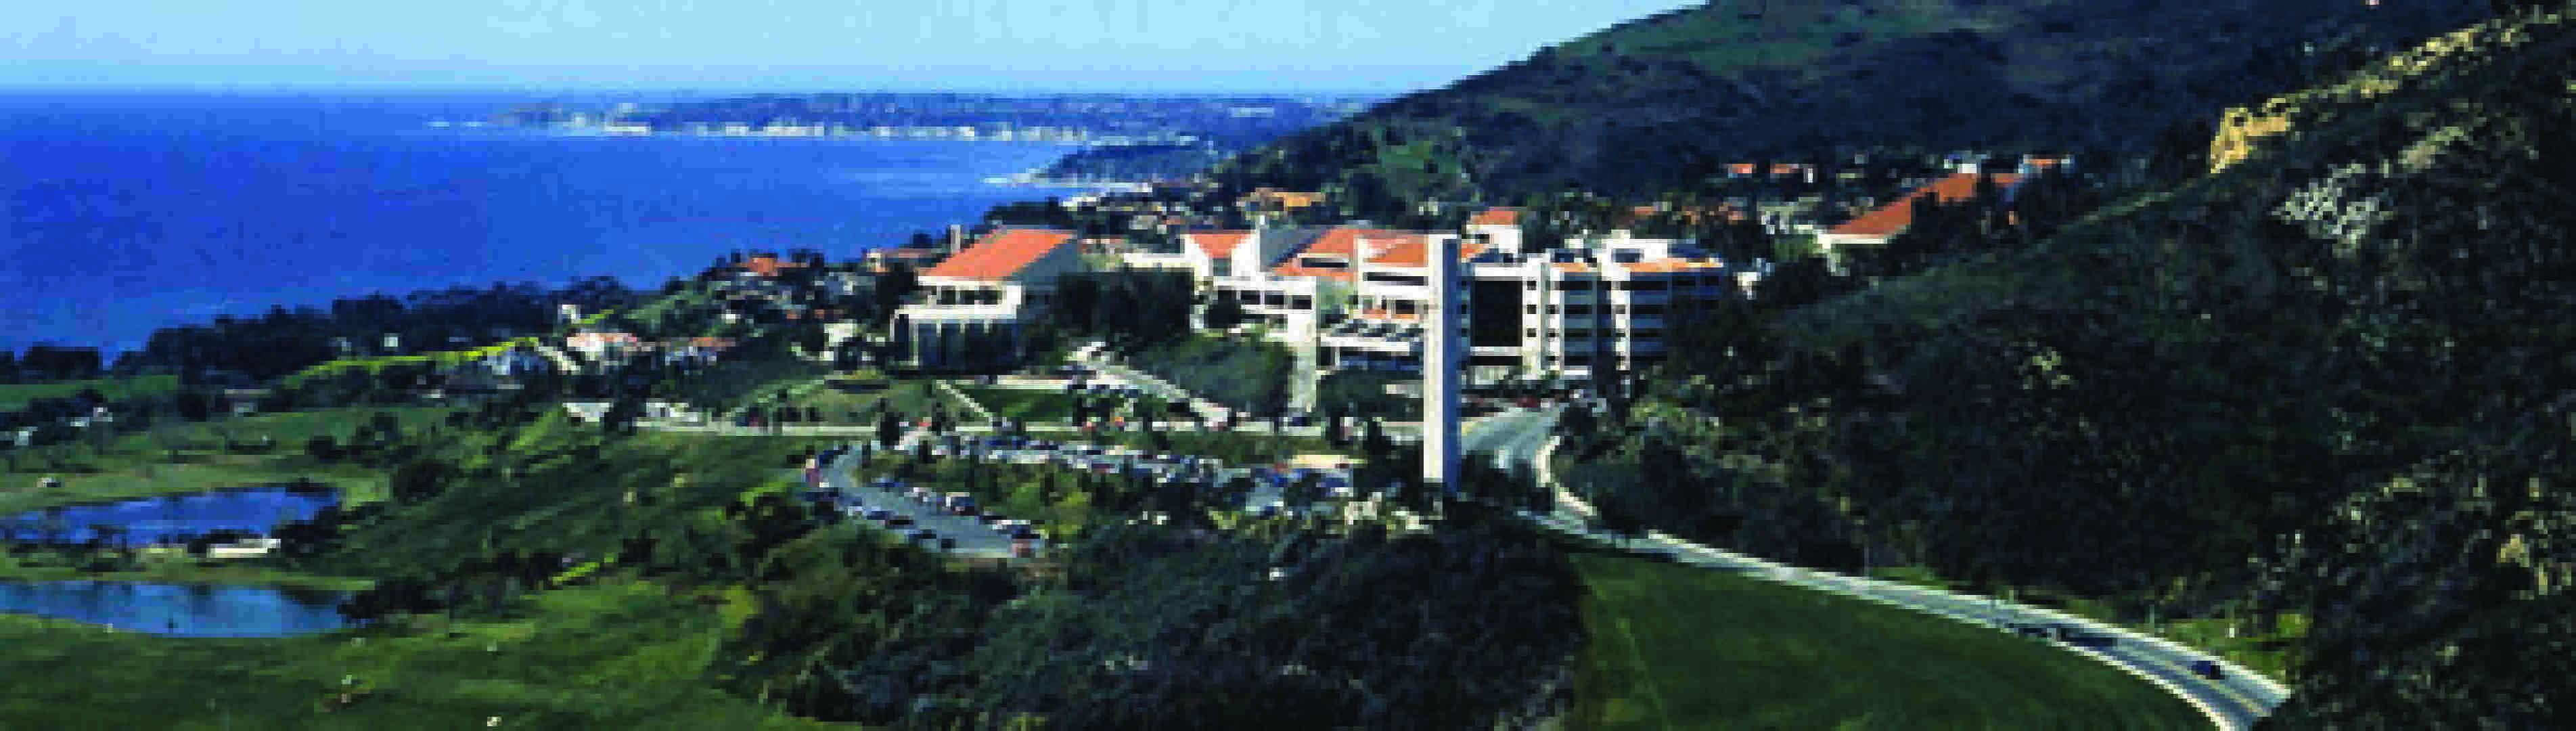 Pepperdine Malibu Campus Map.Els Language Centers At Pepperdine University Malibu Ca Malibu